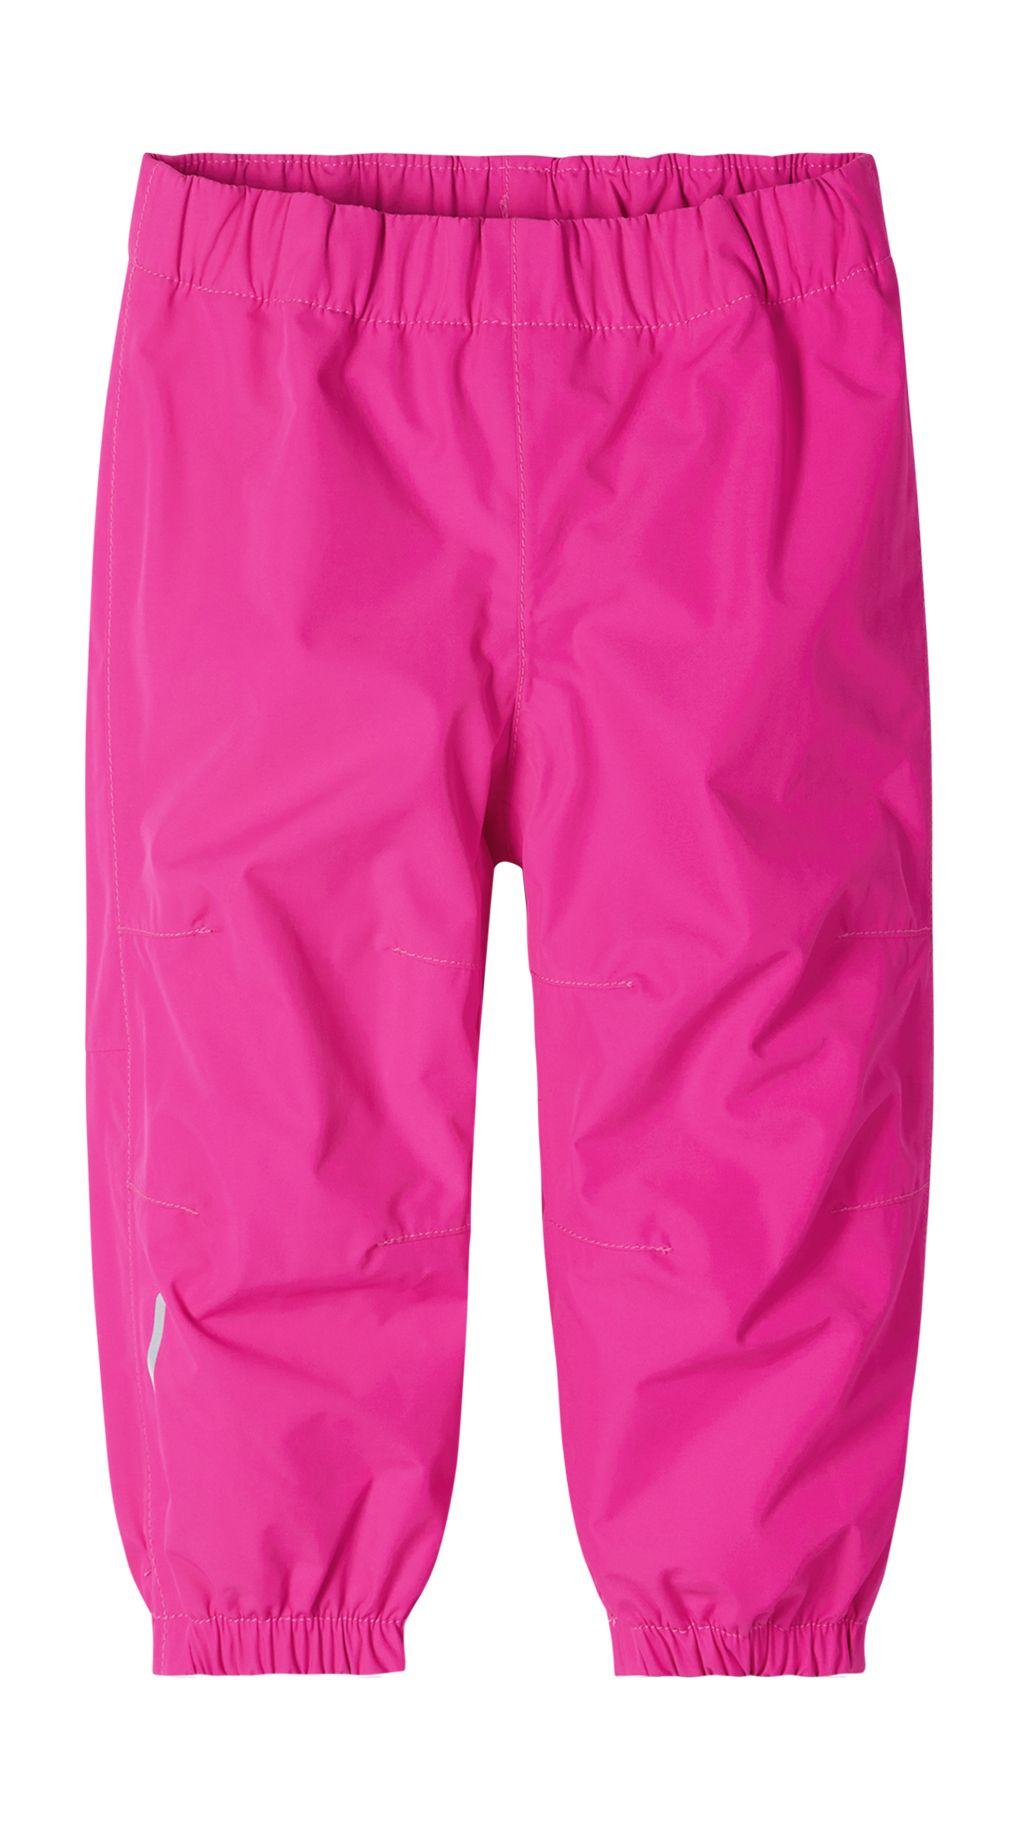 REIMA Kaura Fuchsia Pink 128